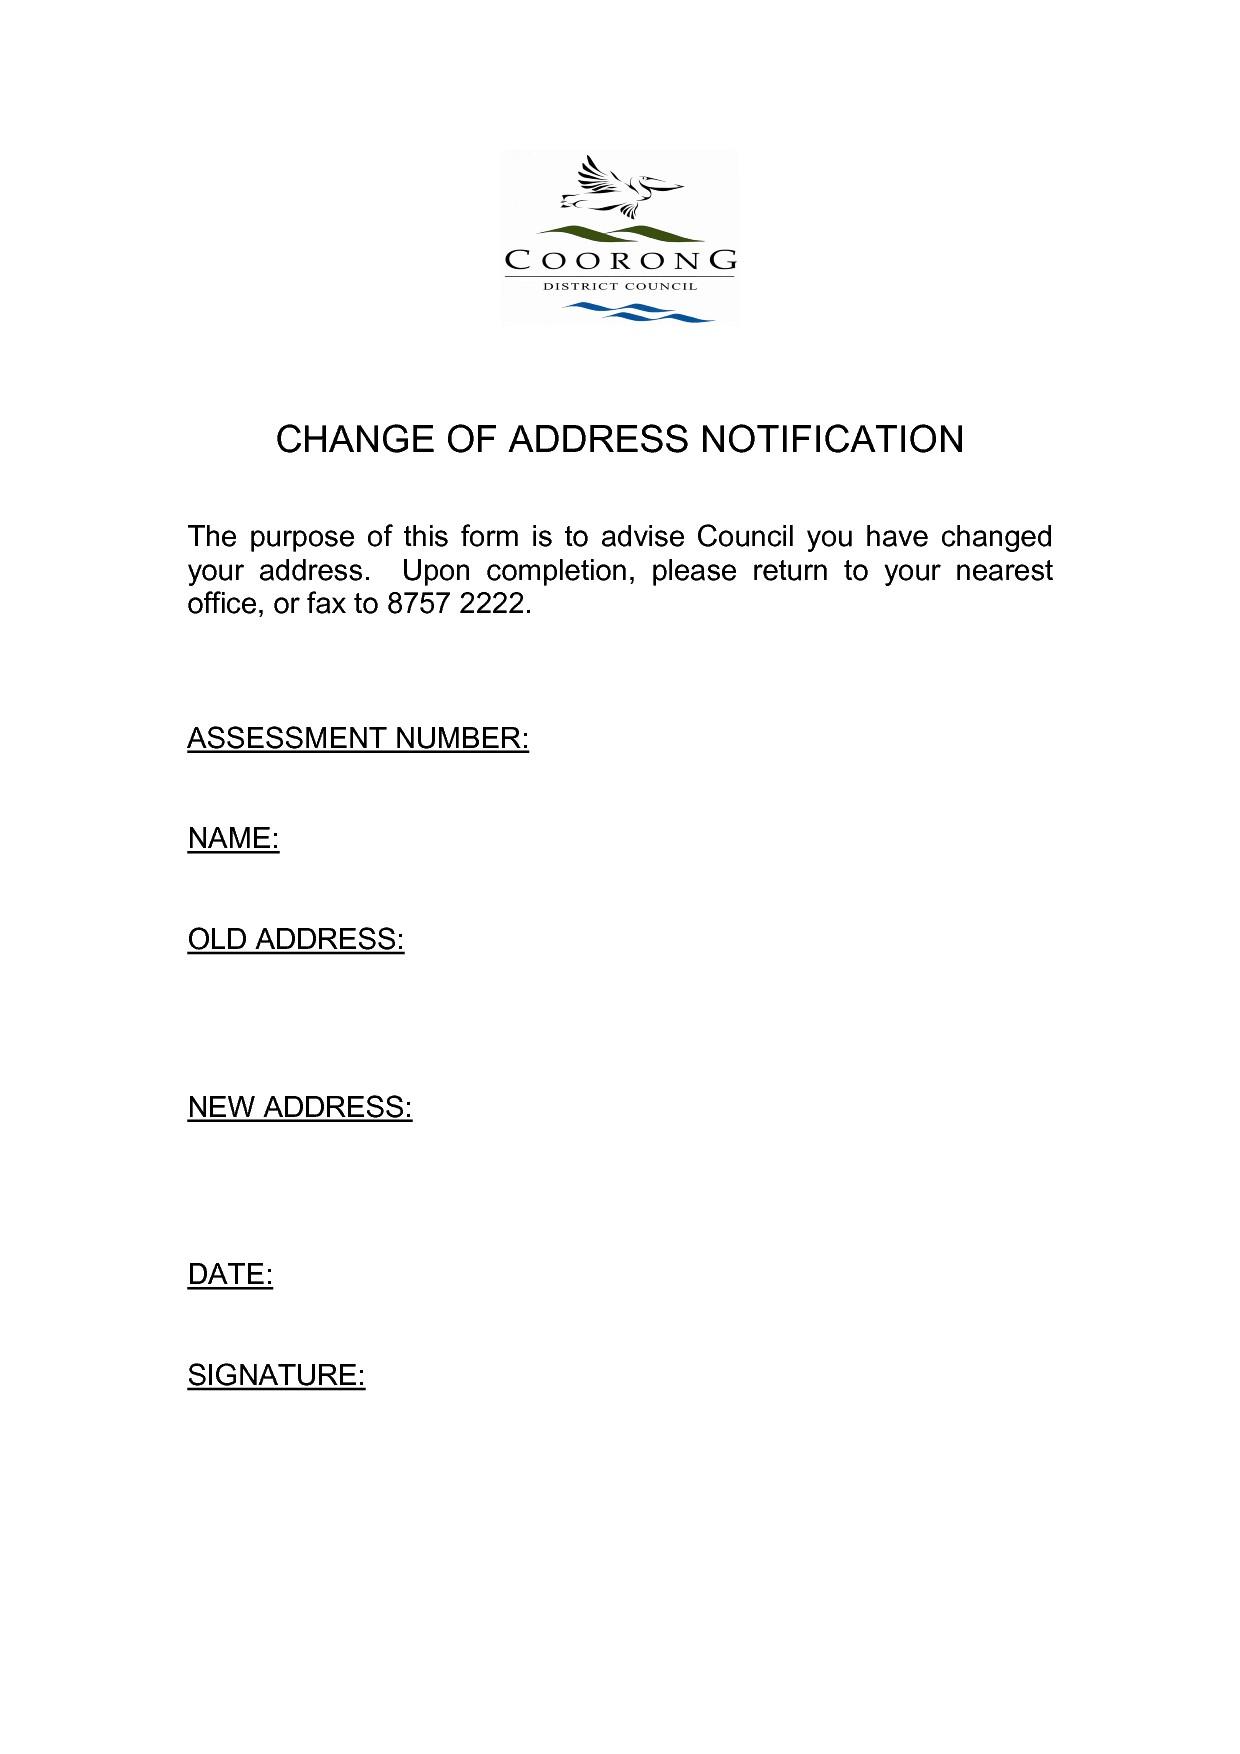 Change Of Address Letter Template - Elegant Change Business Address Letter Template